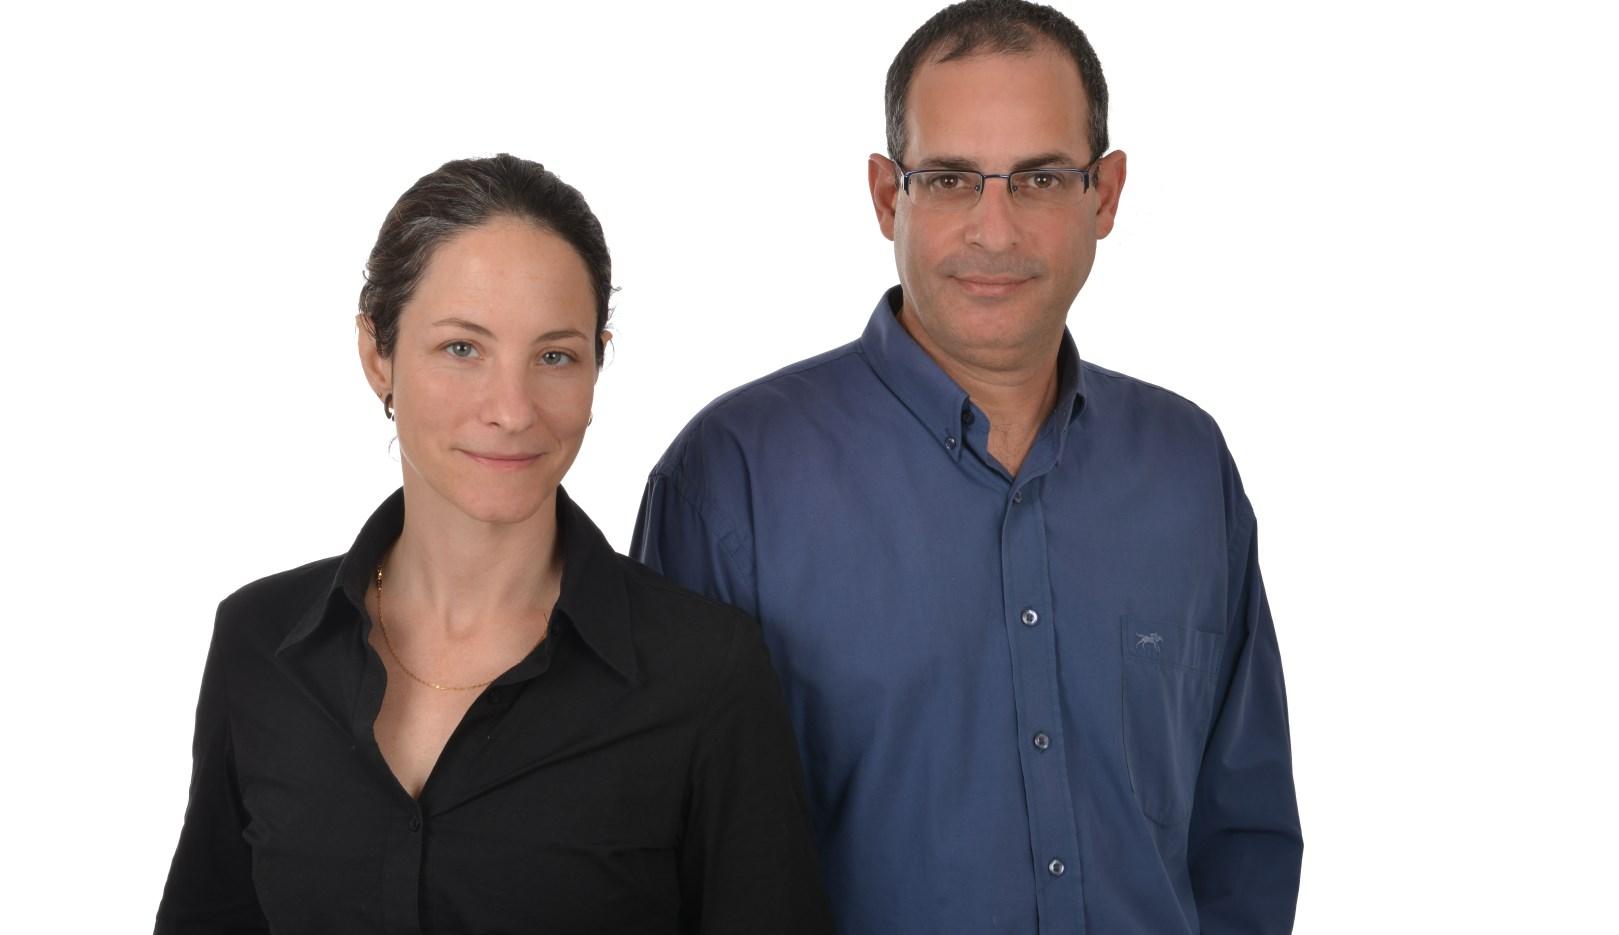 3 Million Club CEO Chamutal Afek-Eitam and COO Oren Sela. Photo by Louiz Green